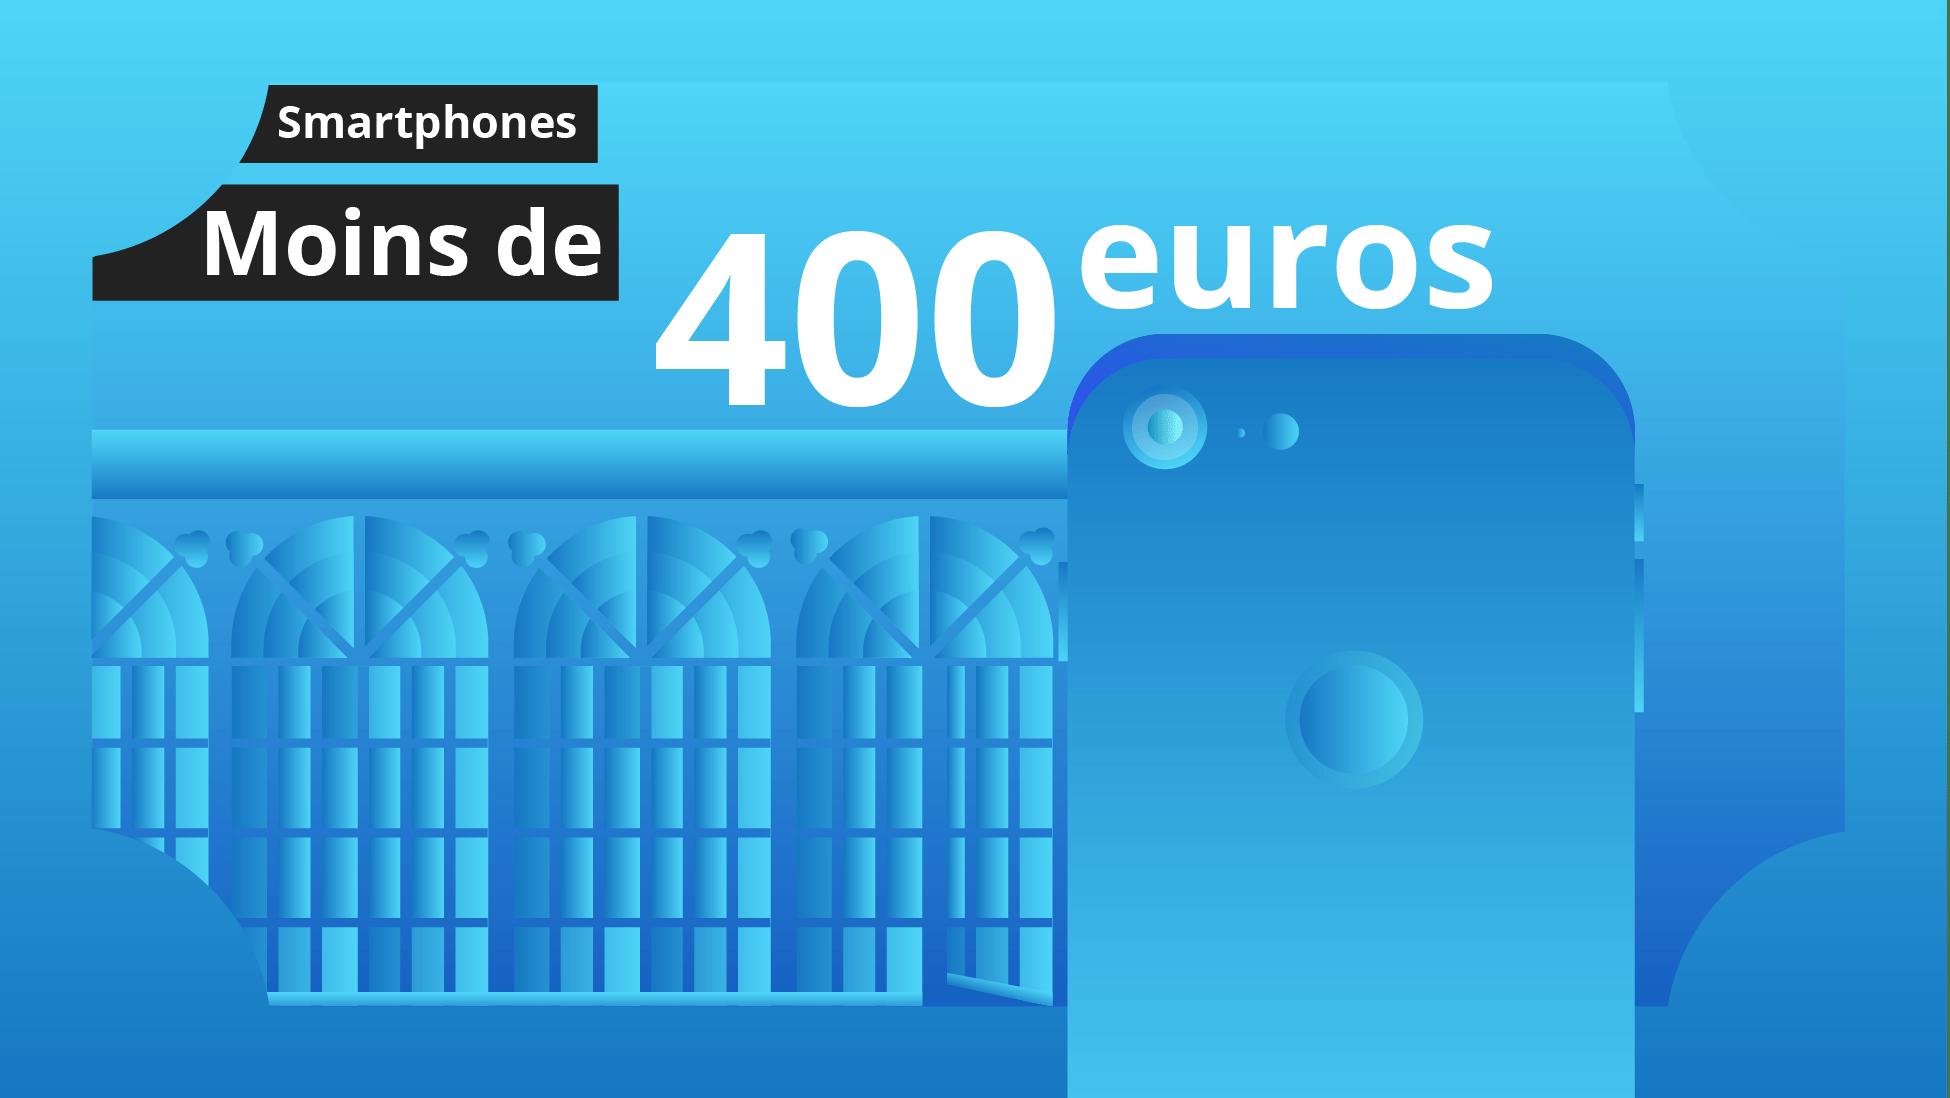 les meilleurs smartphones android moins de 400 euros en 2018 frandroid. Black Bedroom Furniture Sets. Home Design Ideas